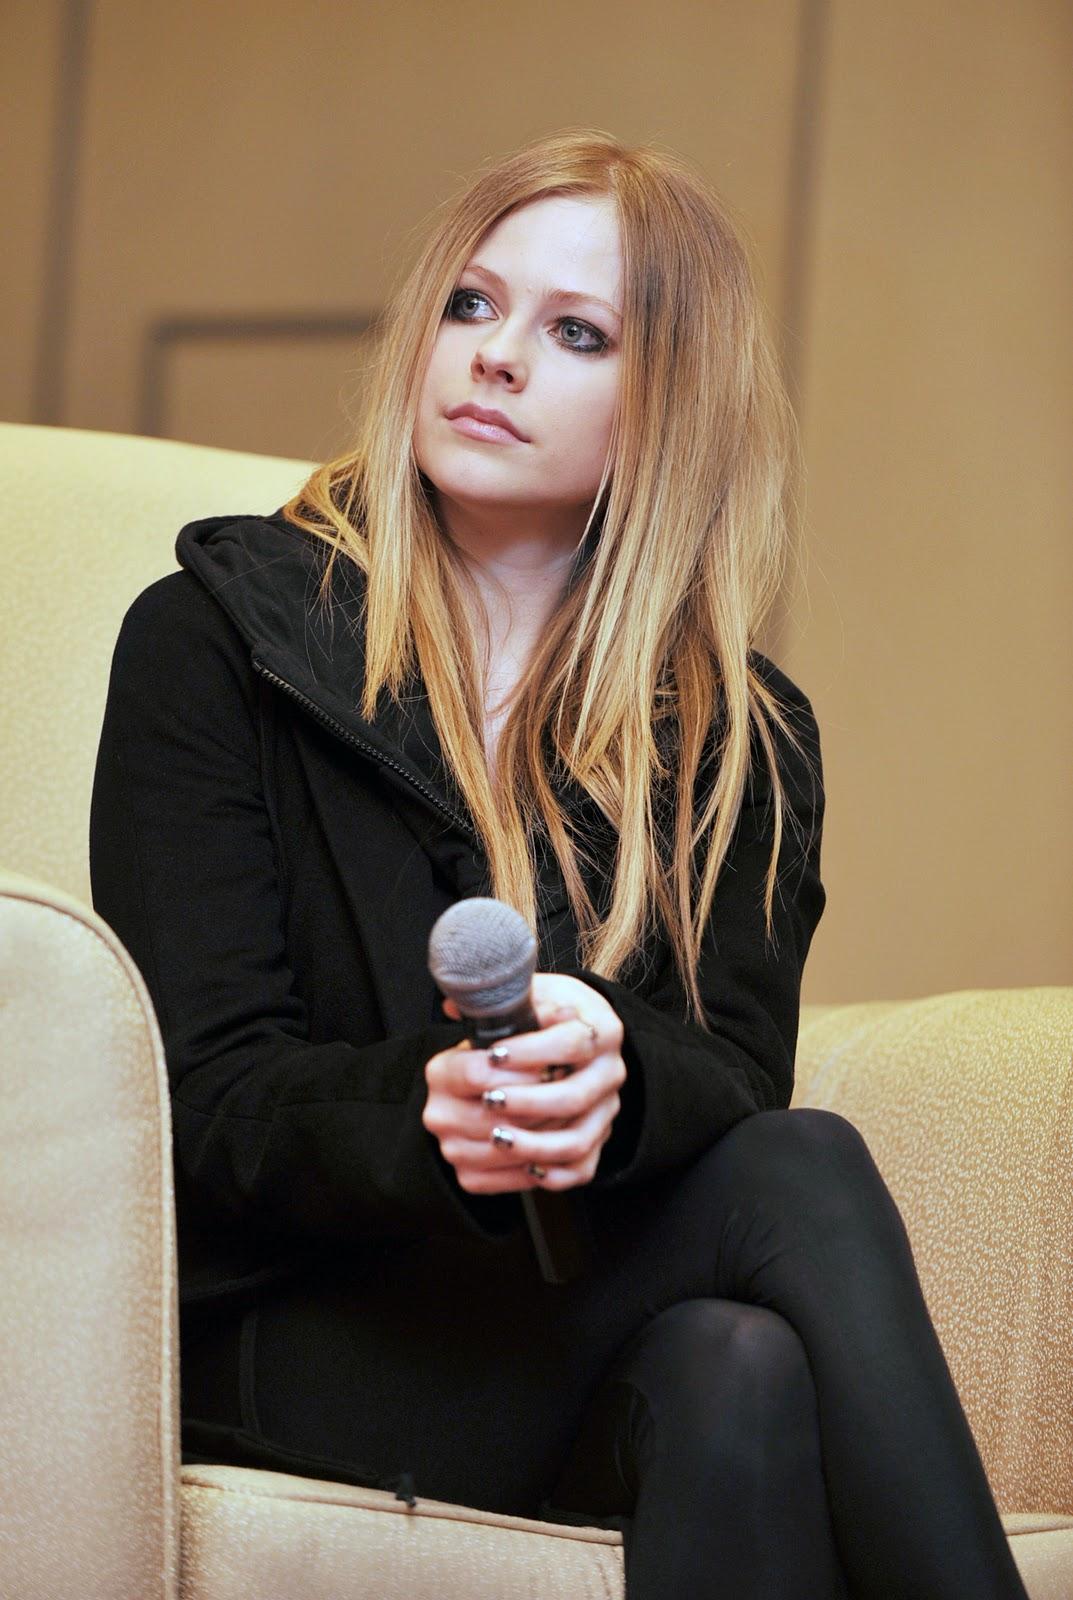 New China Girl Wallpaper Avril Lavigne In China Sweet Pics